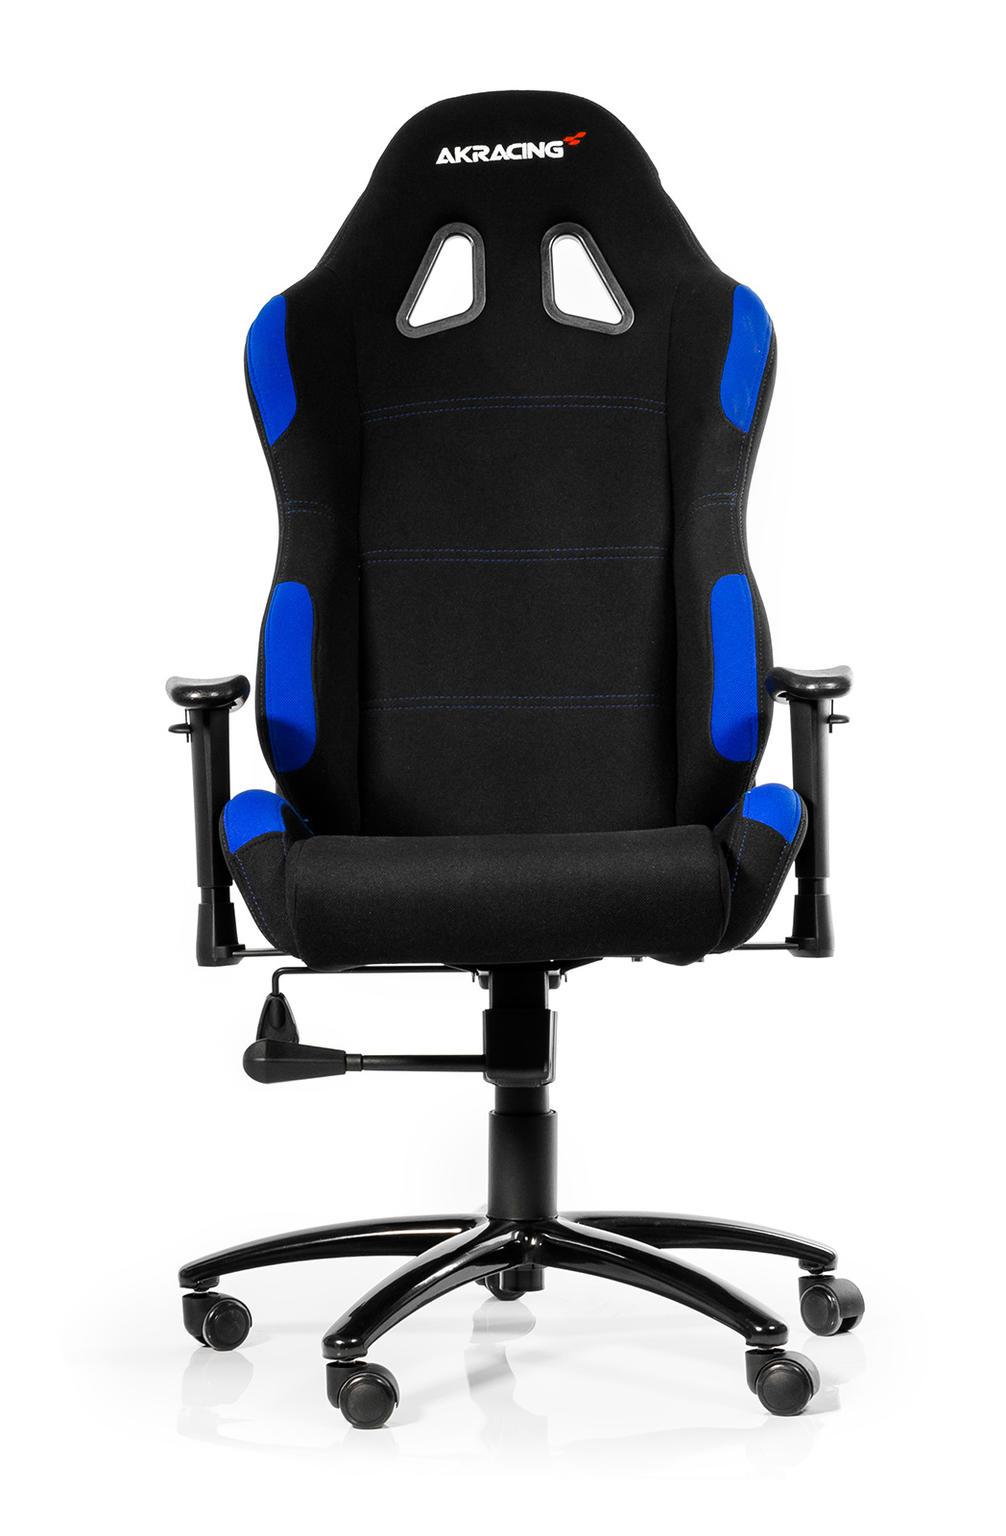 Gaming stoel AKRACING Gaming Chair zwart-blauw